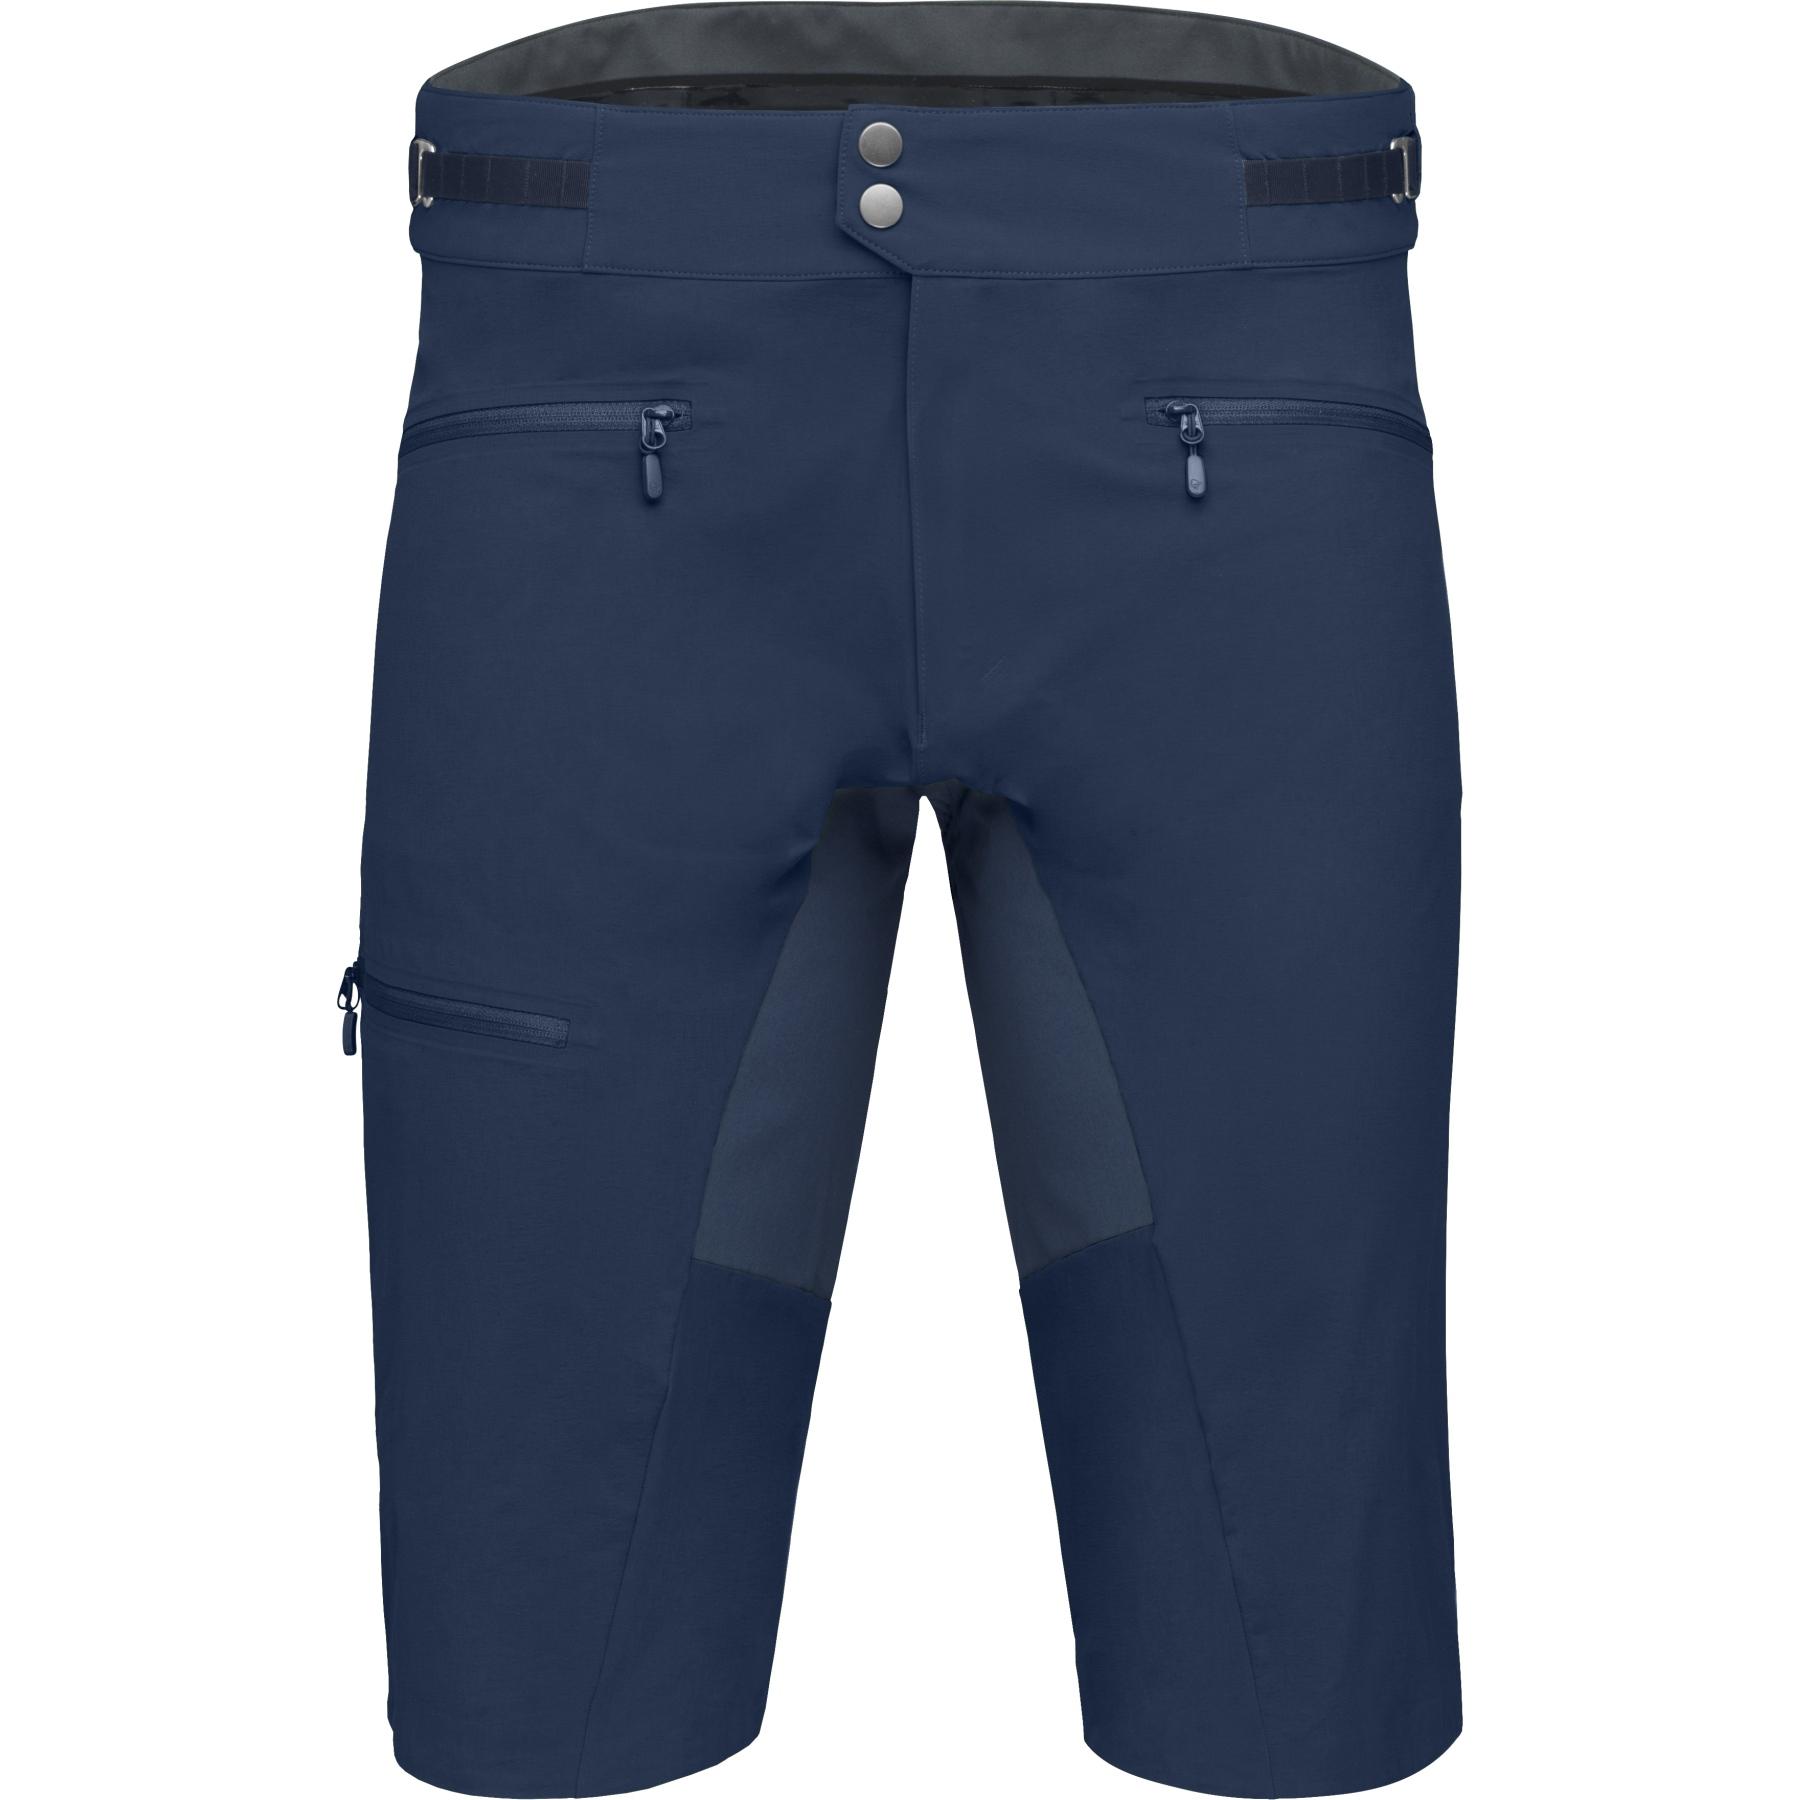 Norrona fjora flex1 mid weight Pantalones cortos para hombres - Indigo Night